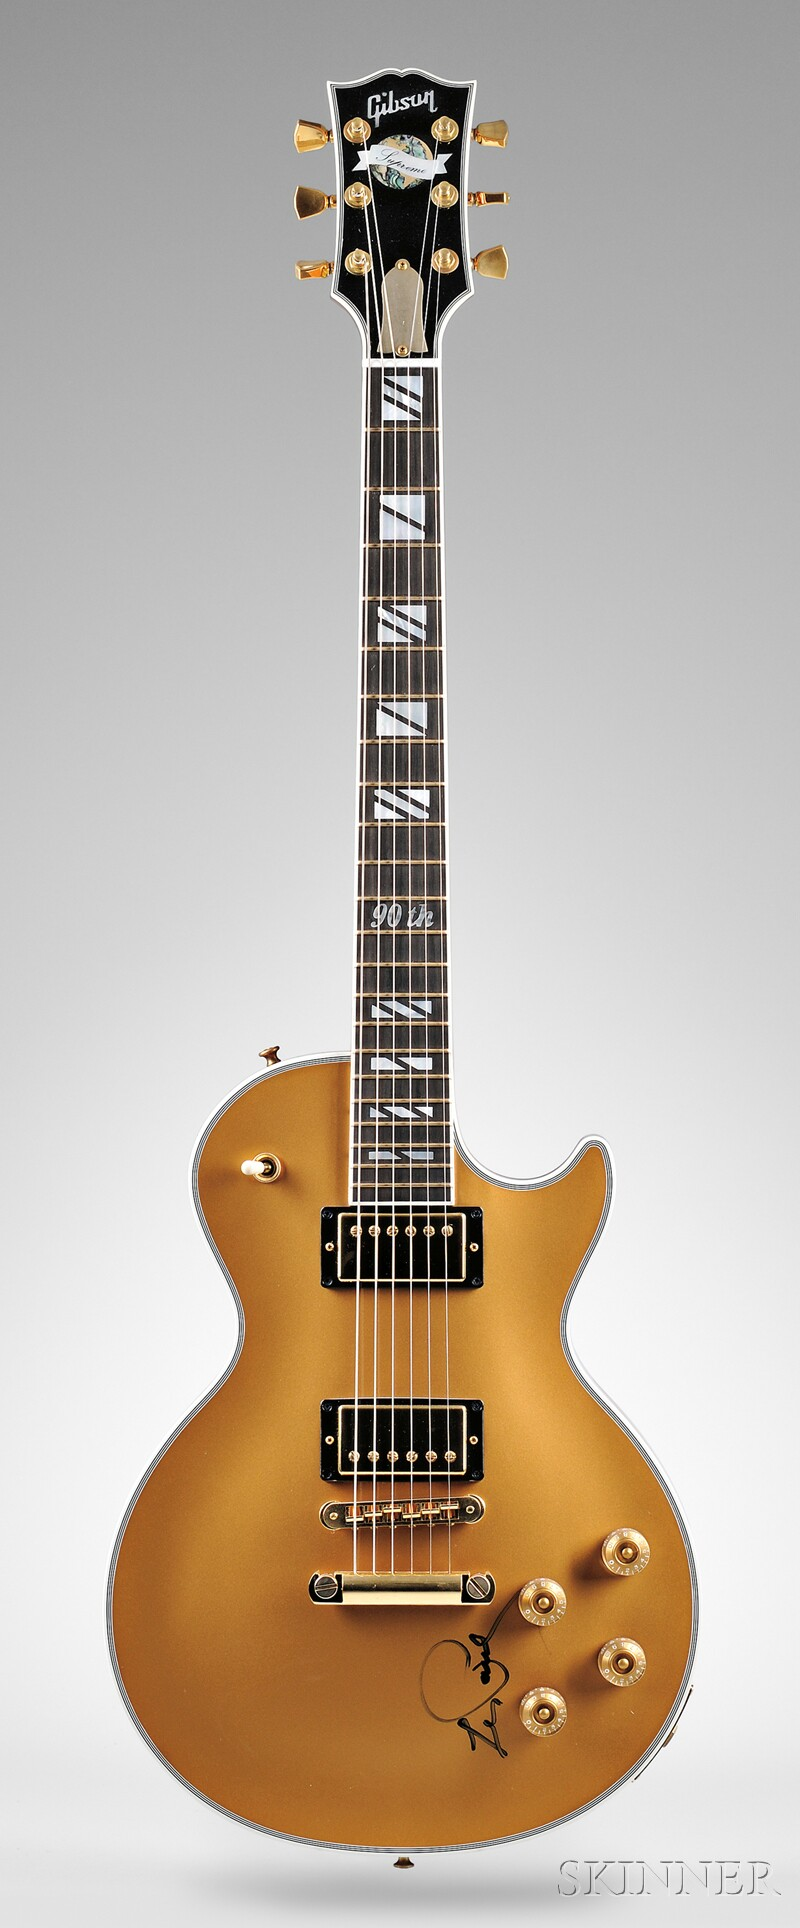 American Electric Guitar, Gibson Musical Instruments, Nashville, 2005, Model   Les Paul Supreme